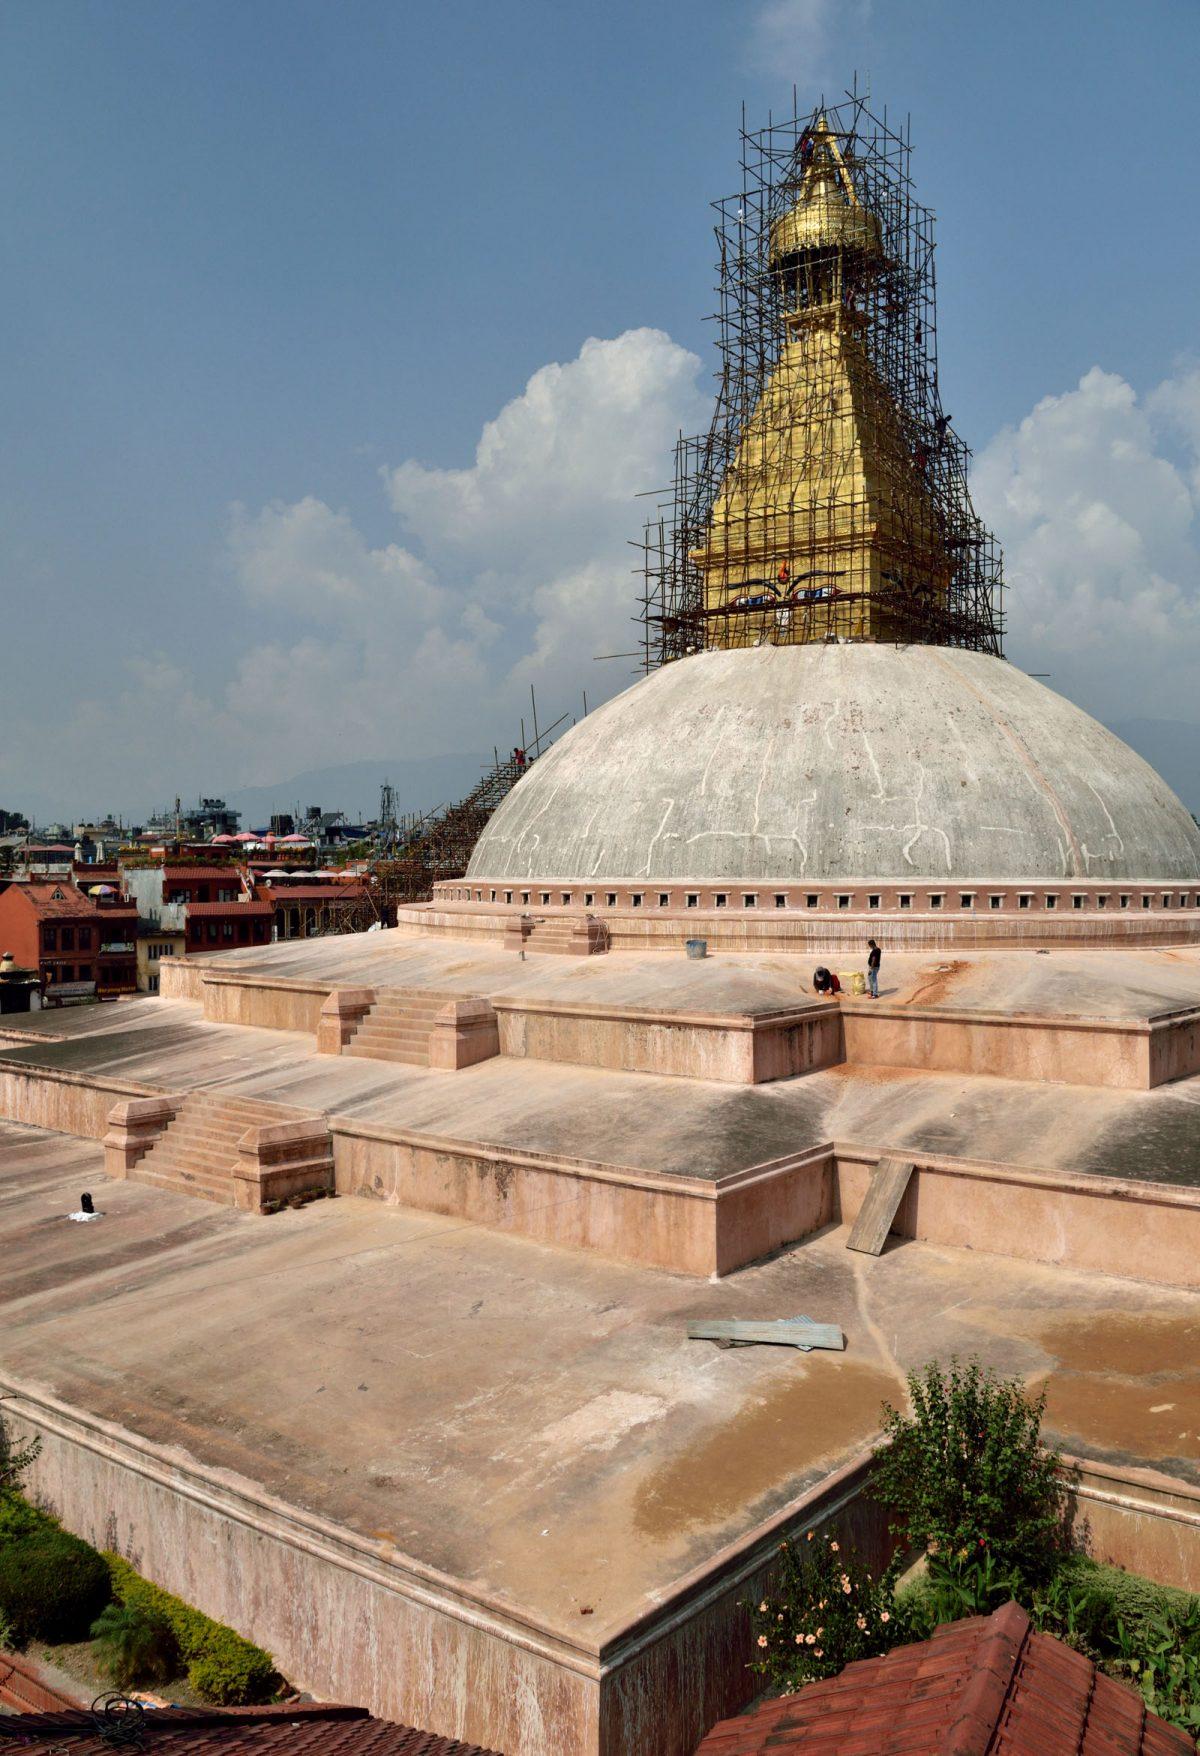 nepal_annapurna-tura_04